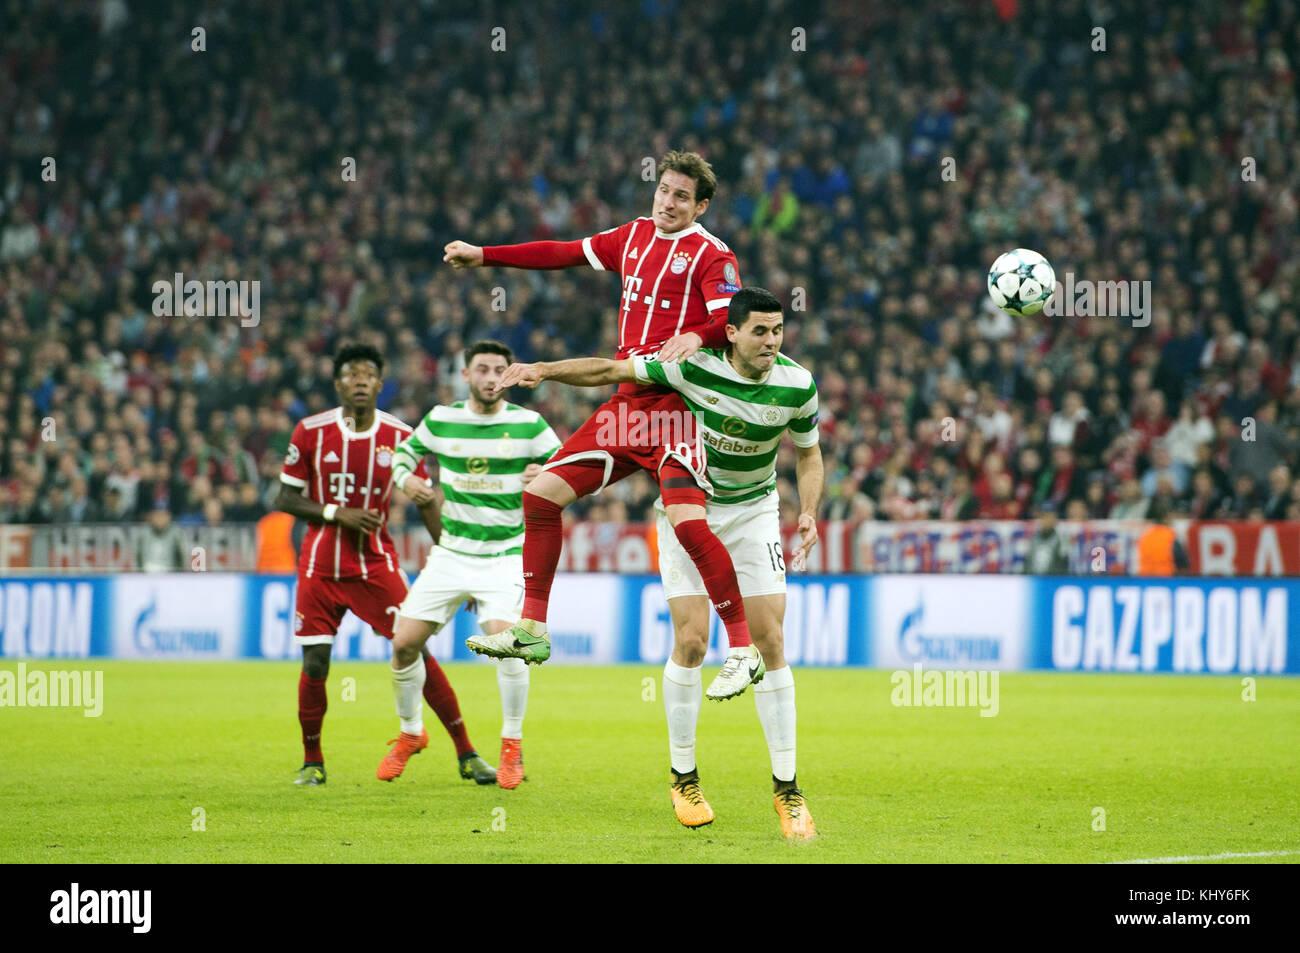 UEFA Champions League: Group B - Bayern Munich vs. Celtic (3-0)  Featuring: Sebastian Rudy, Tom ROGIC Where: Munich, - Stock Image